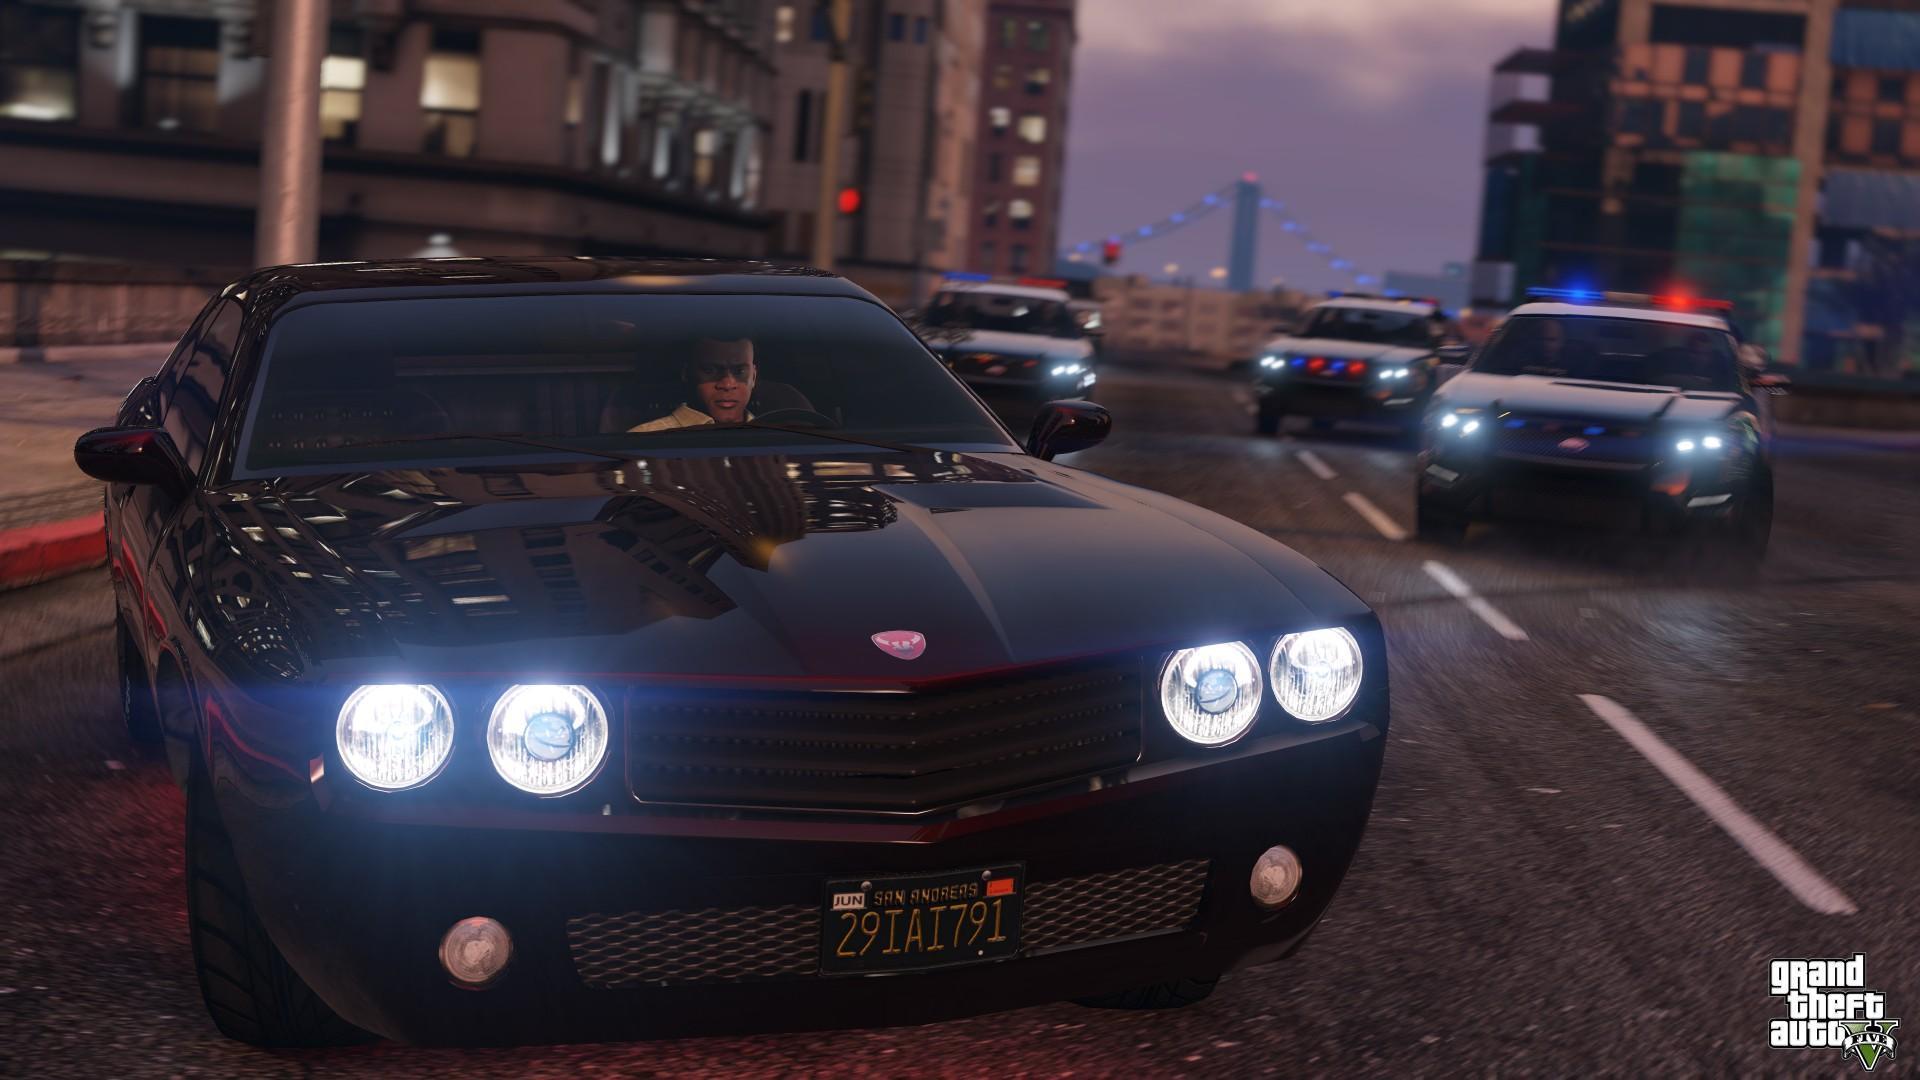 Gauntlet - GTA V Vehicles Database & Statistics - Grand Theft Auto V